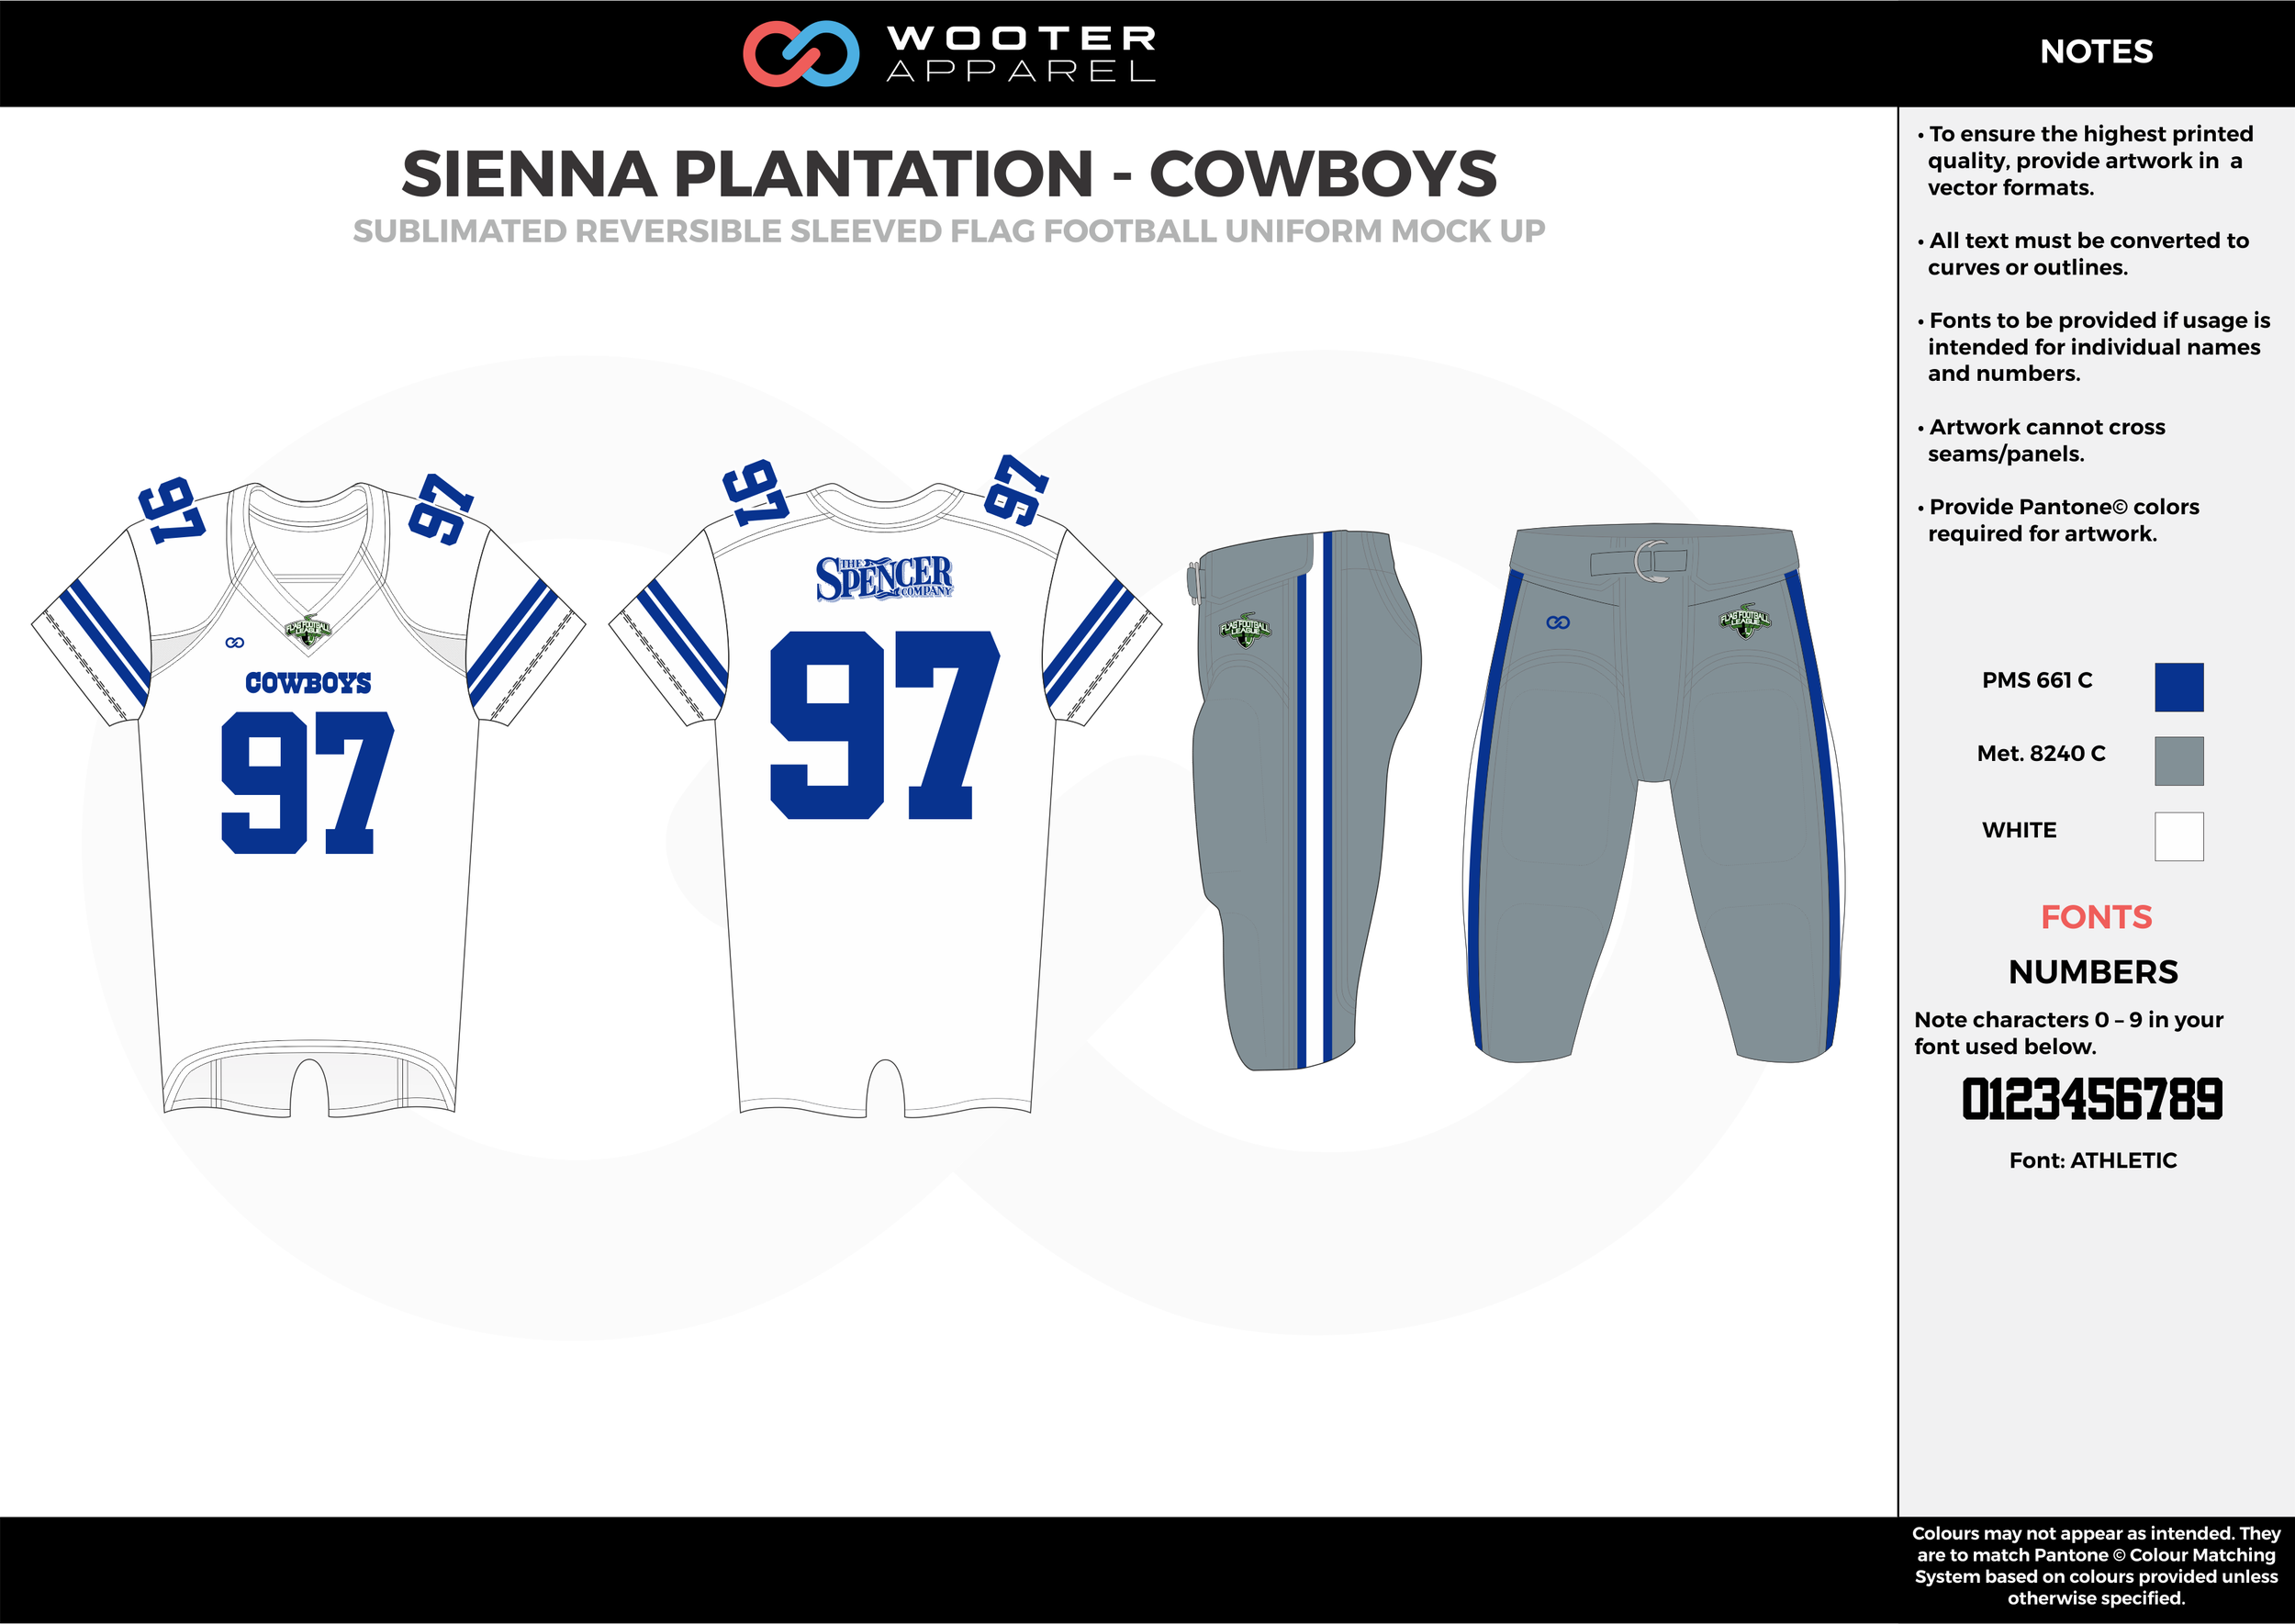 SIENNA PLANTATION - COWBOYS gray white blue Football Uniform, Jersey, Pants, Integraded